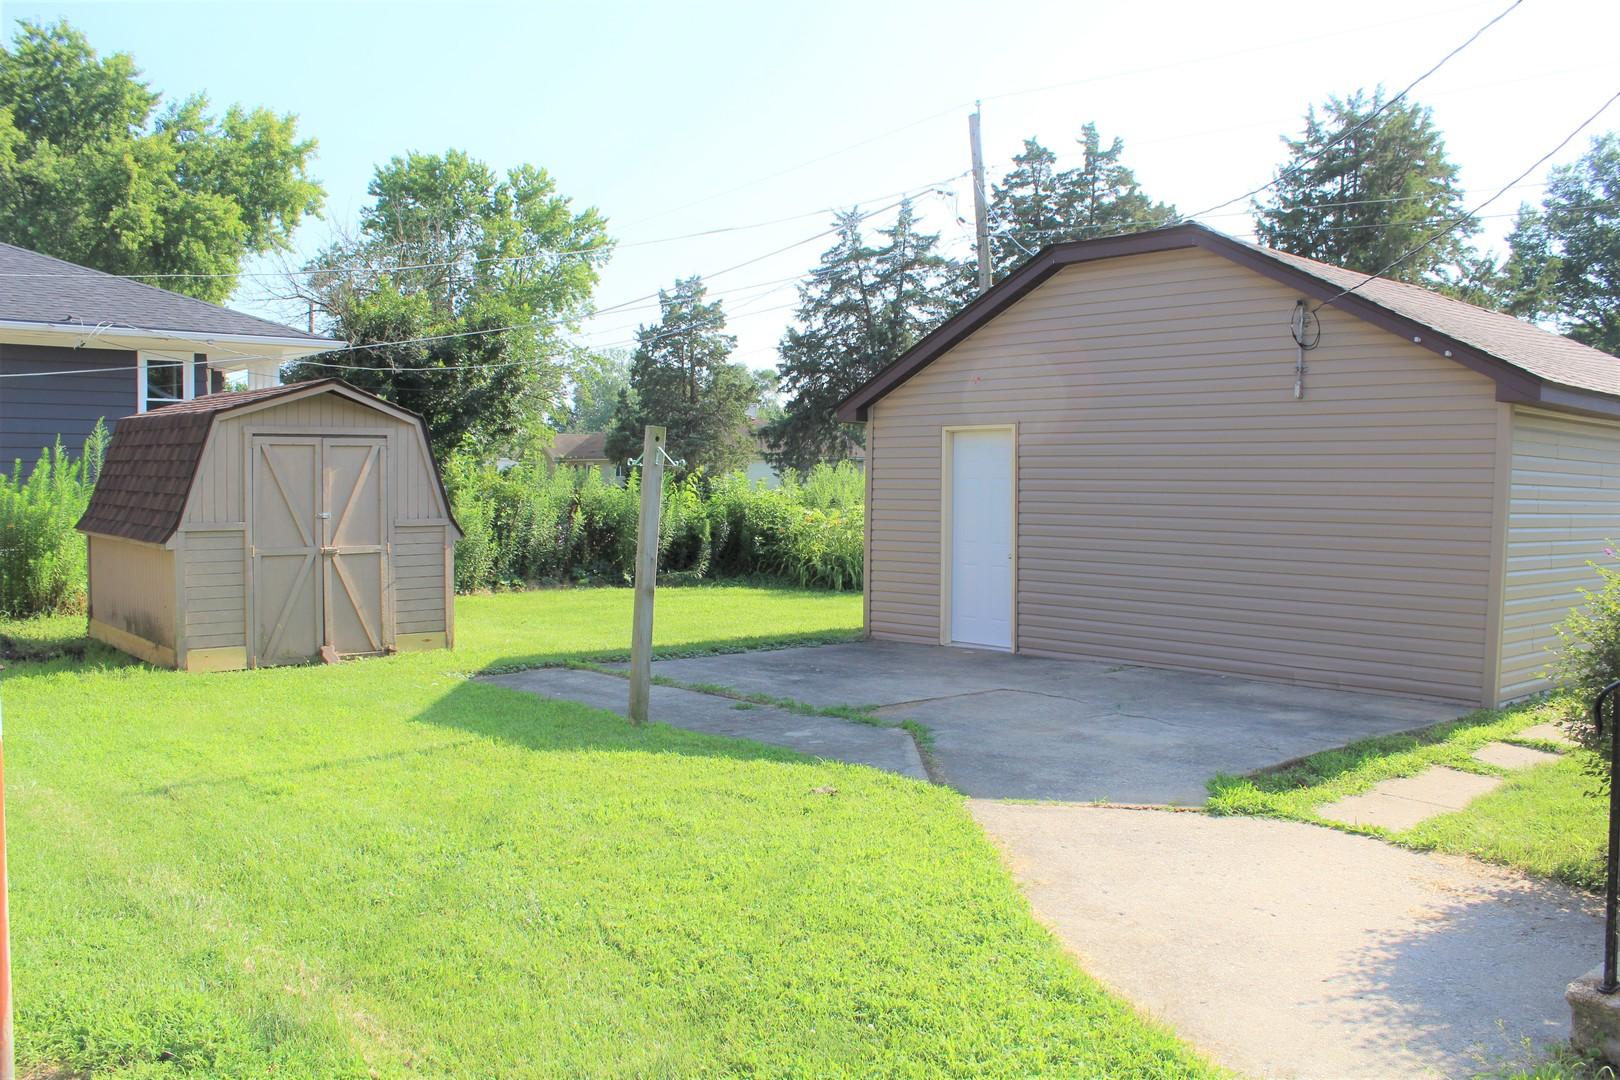 295 West Division, Coal City, Illinois, 60416